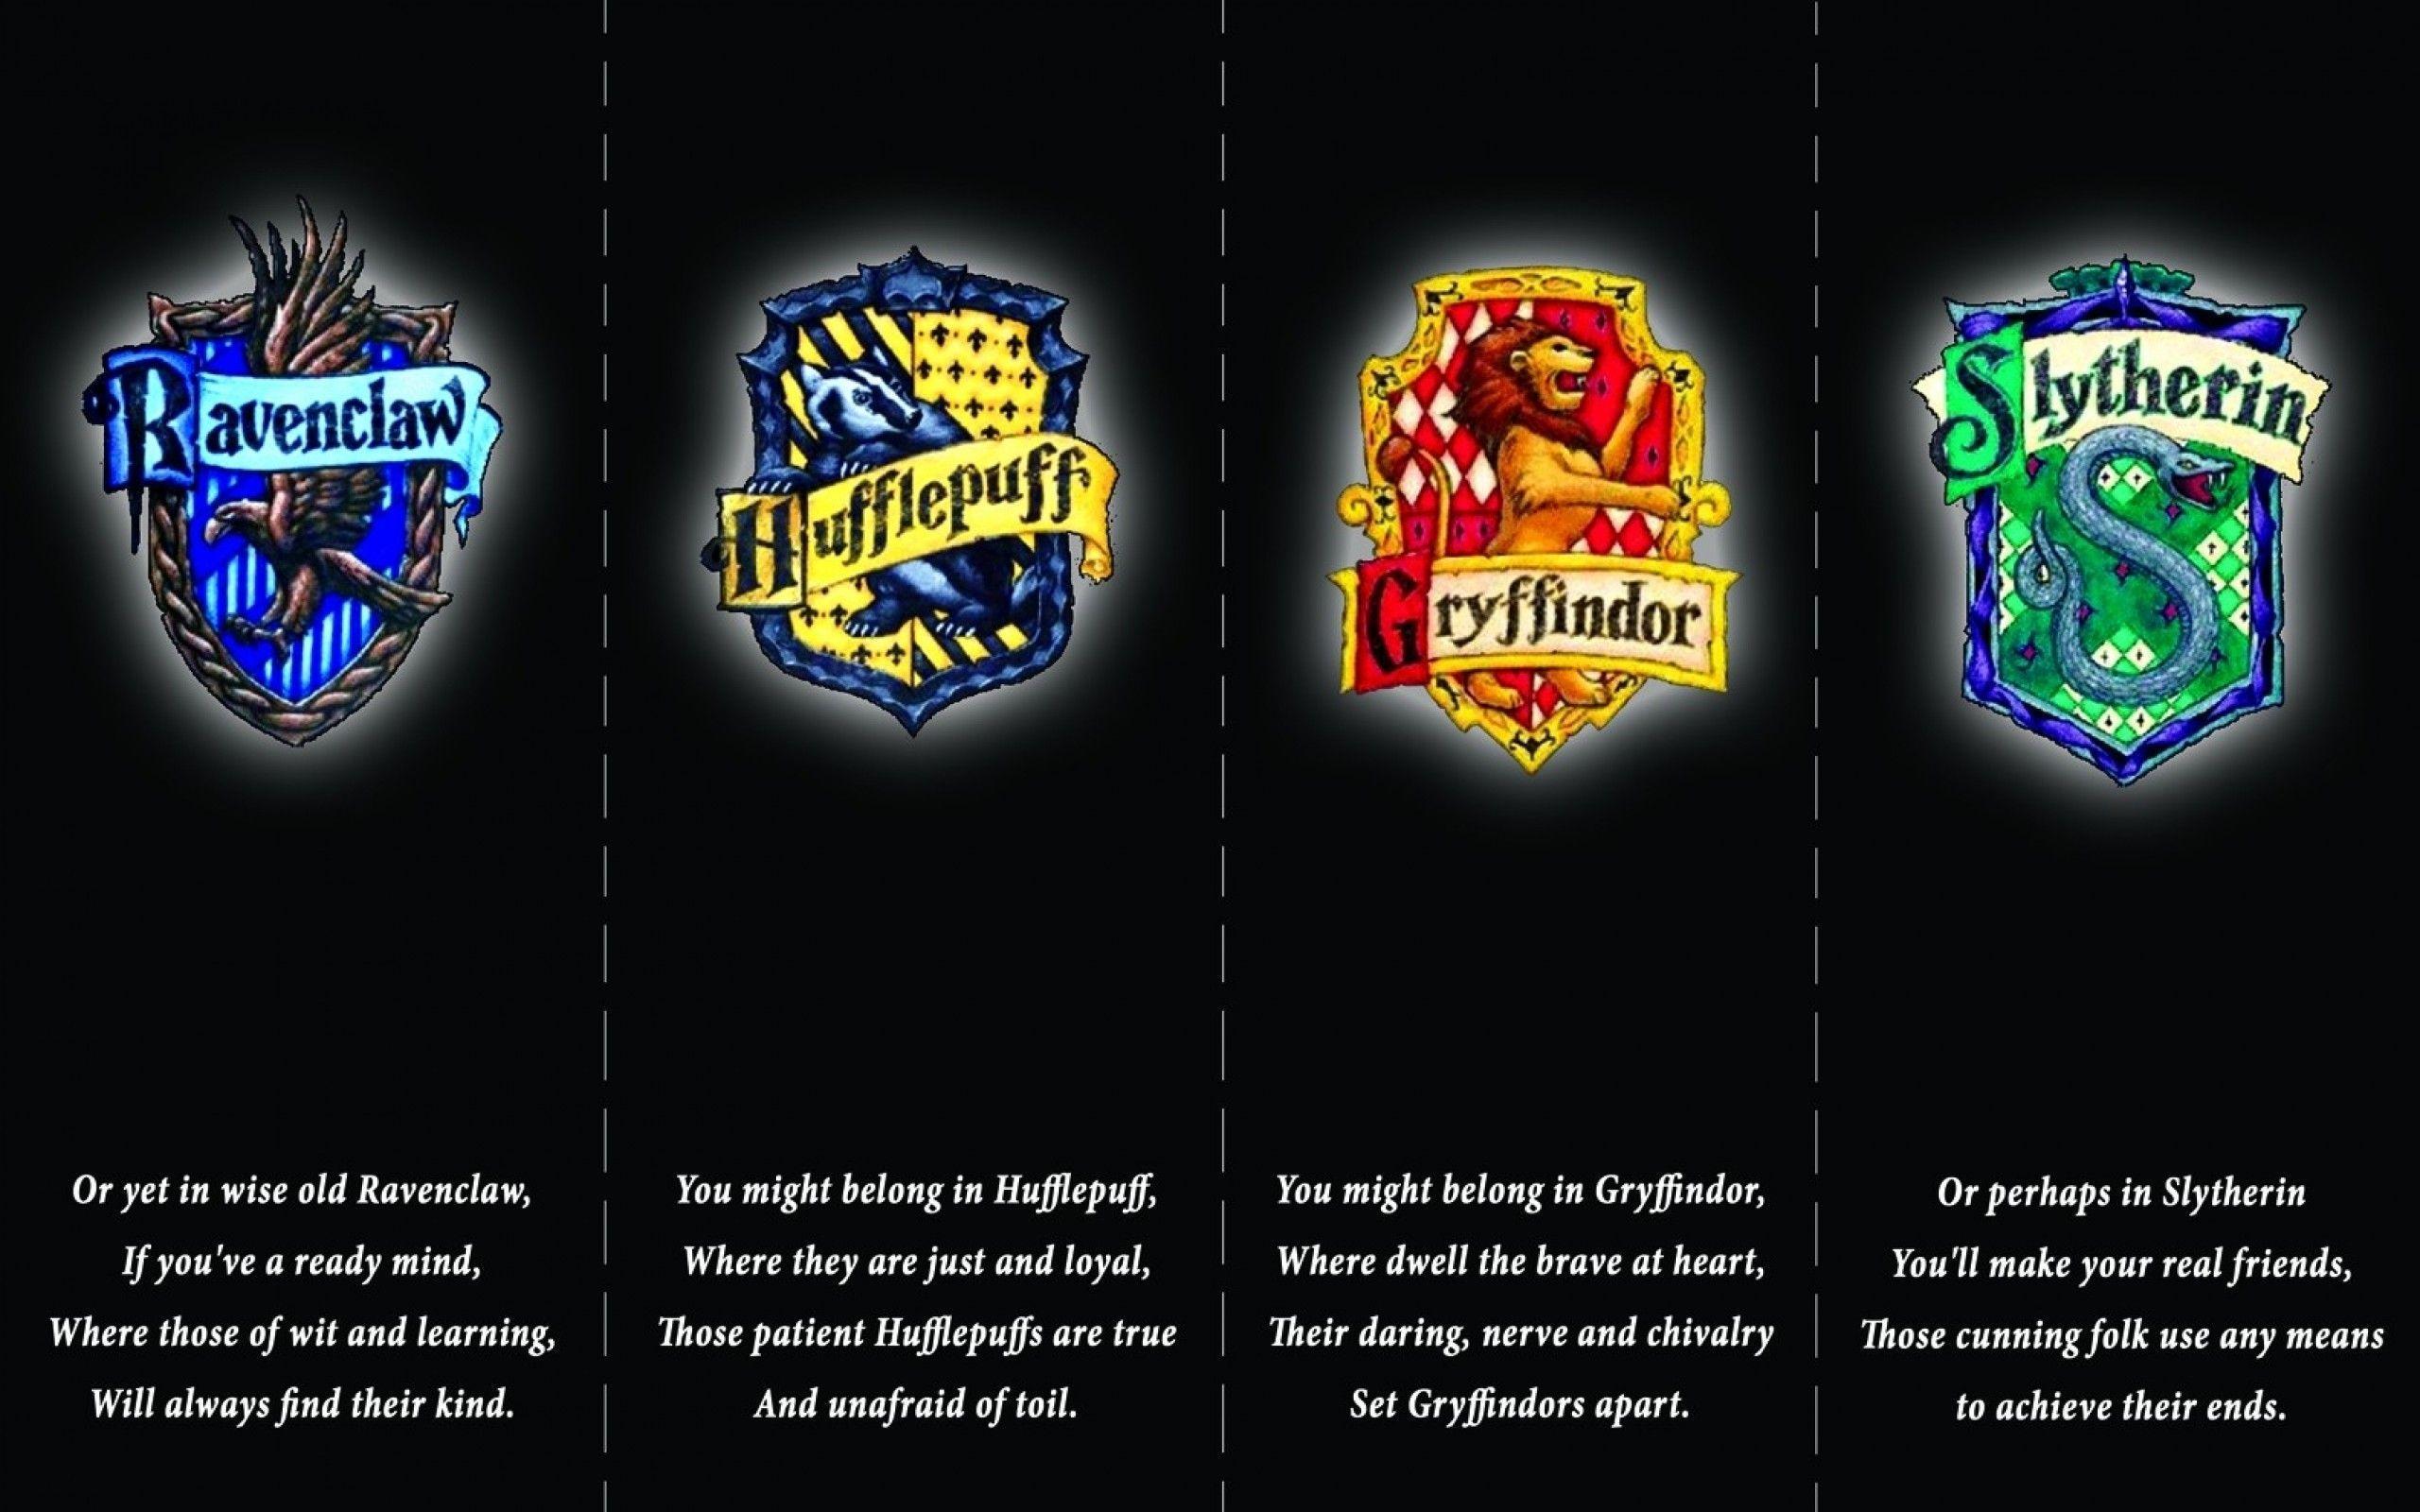 Harry Potter Wallpapers Hogwarts Slytherin Wallpaper Cave